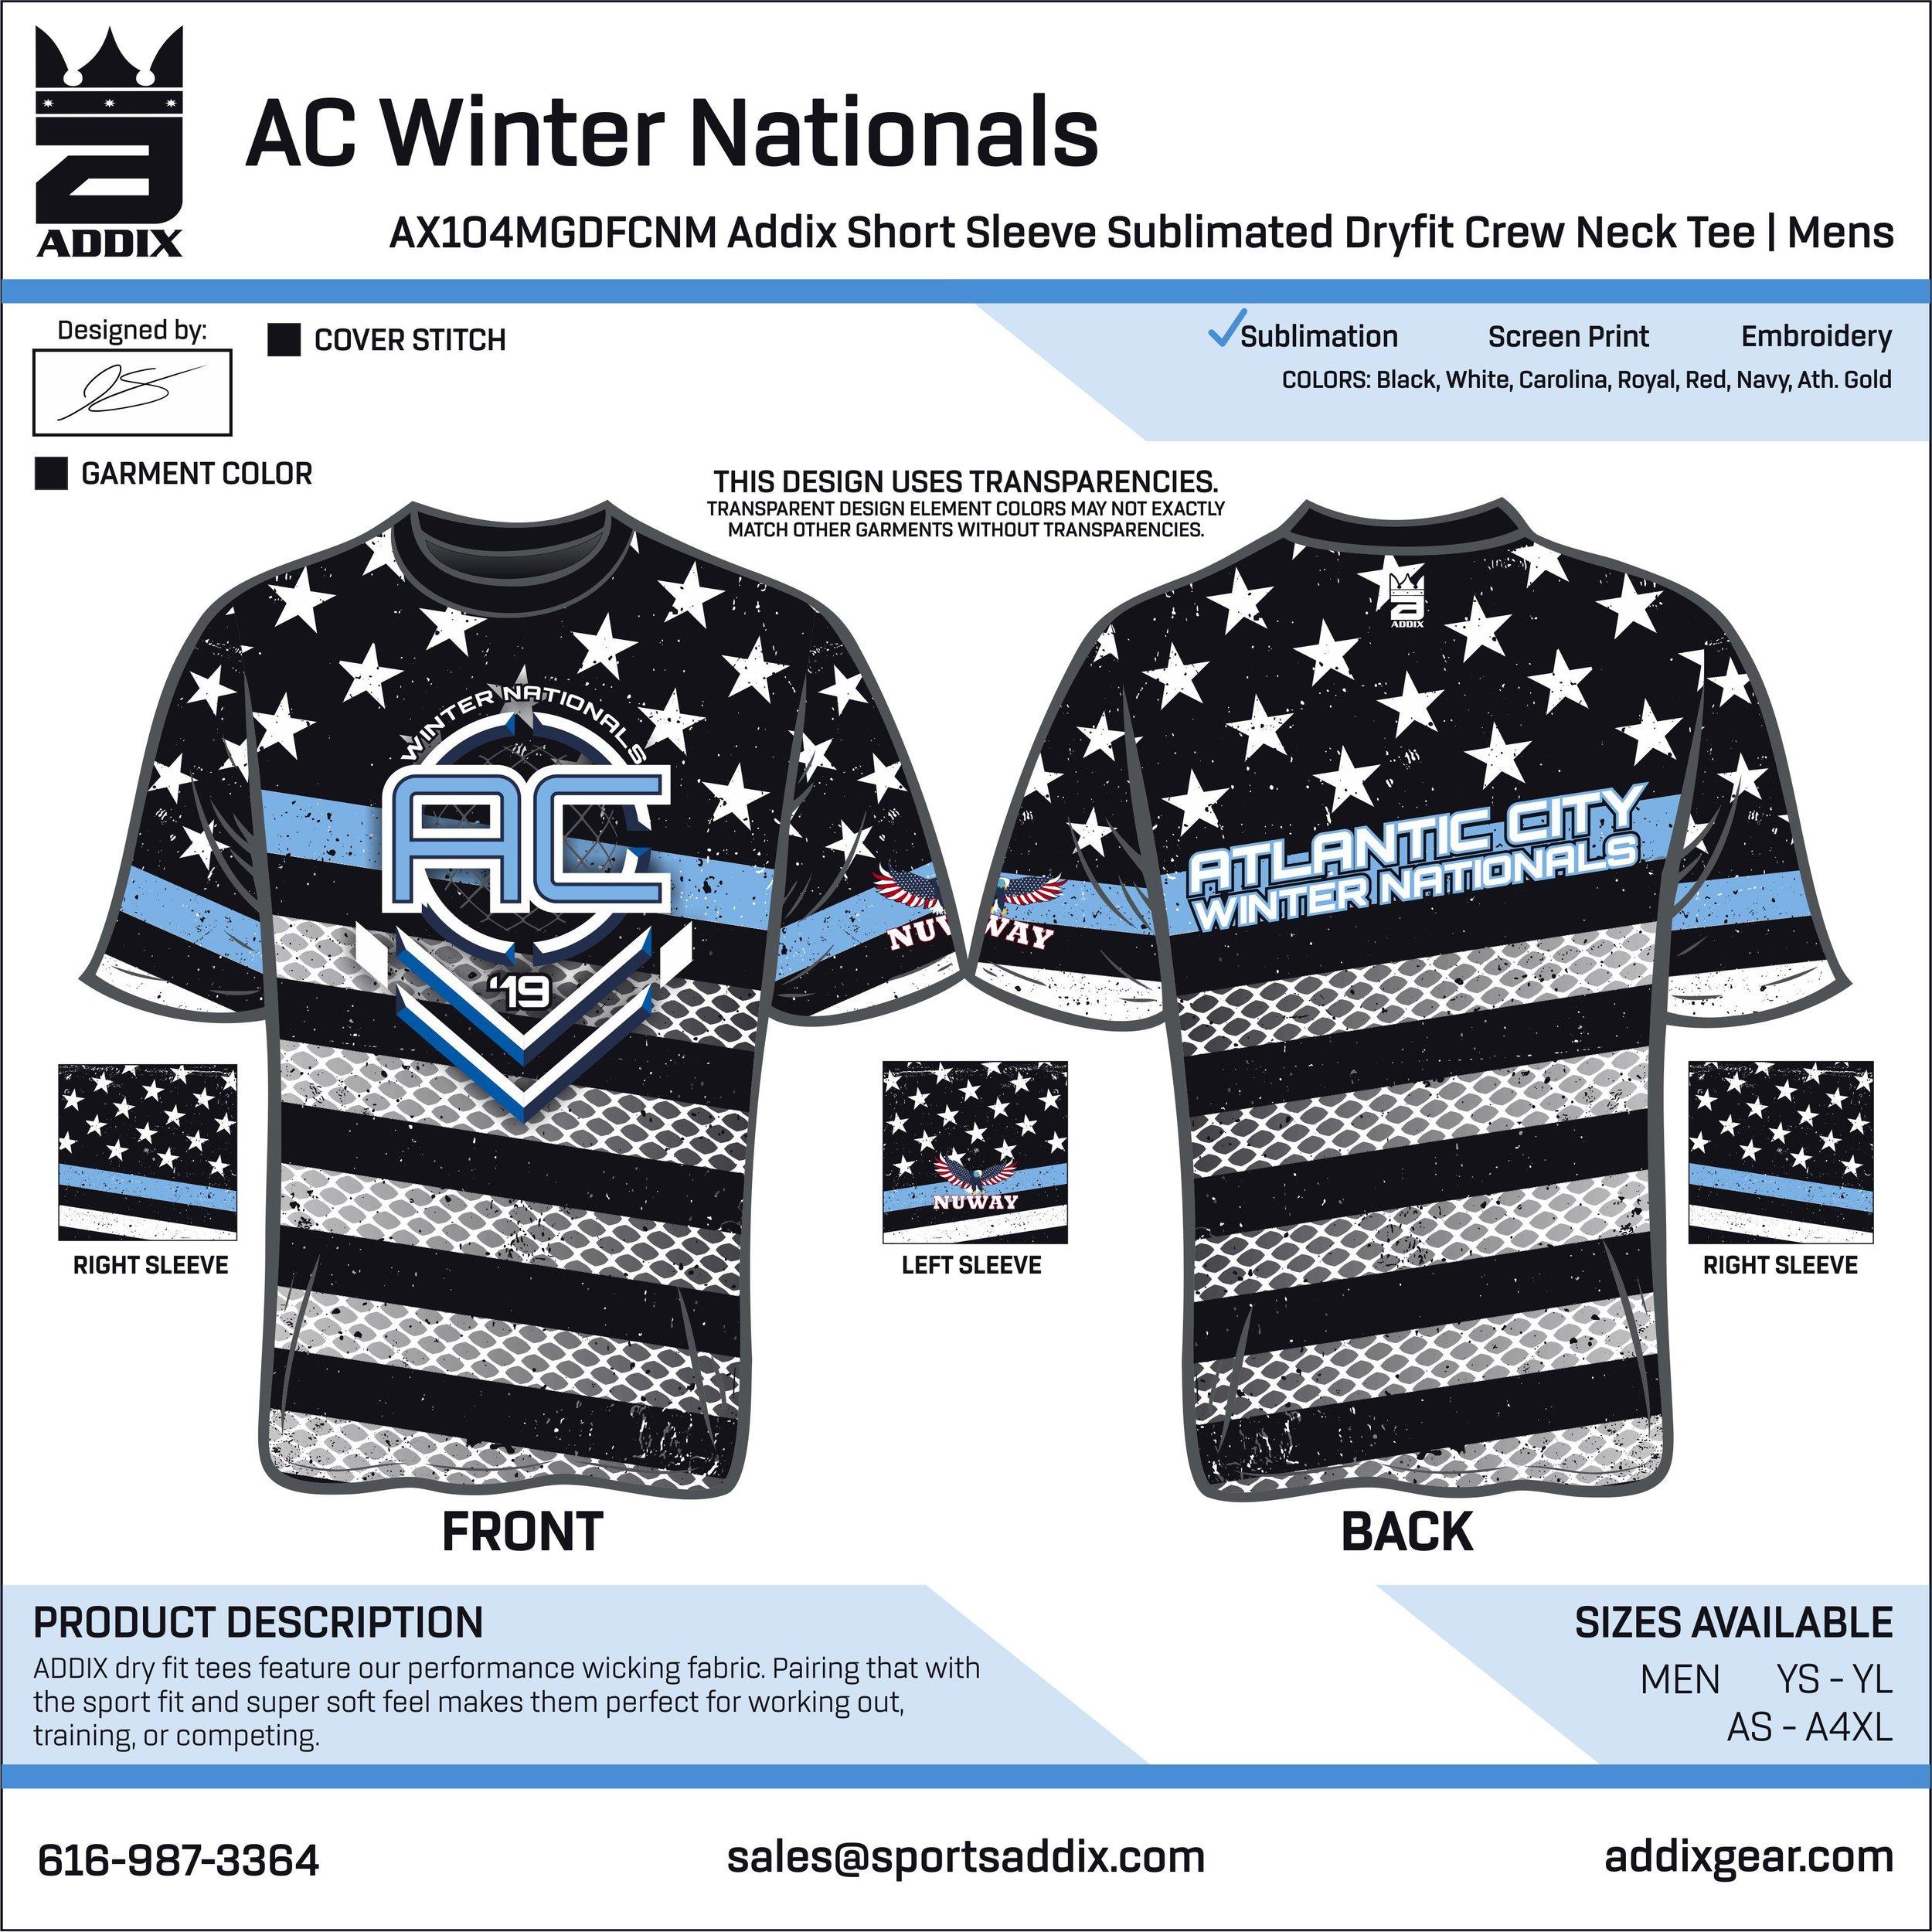 AC Winter Nationals_2018_11-20_JE_SS Full Sub DF.jpg